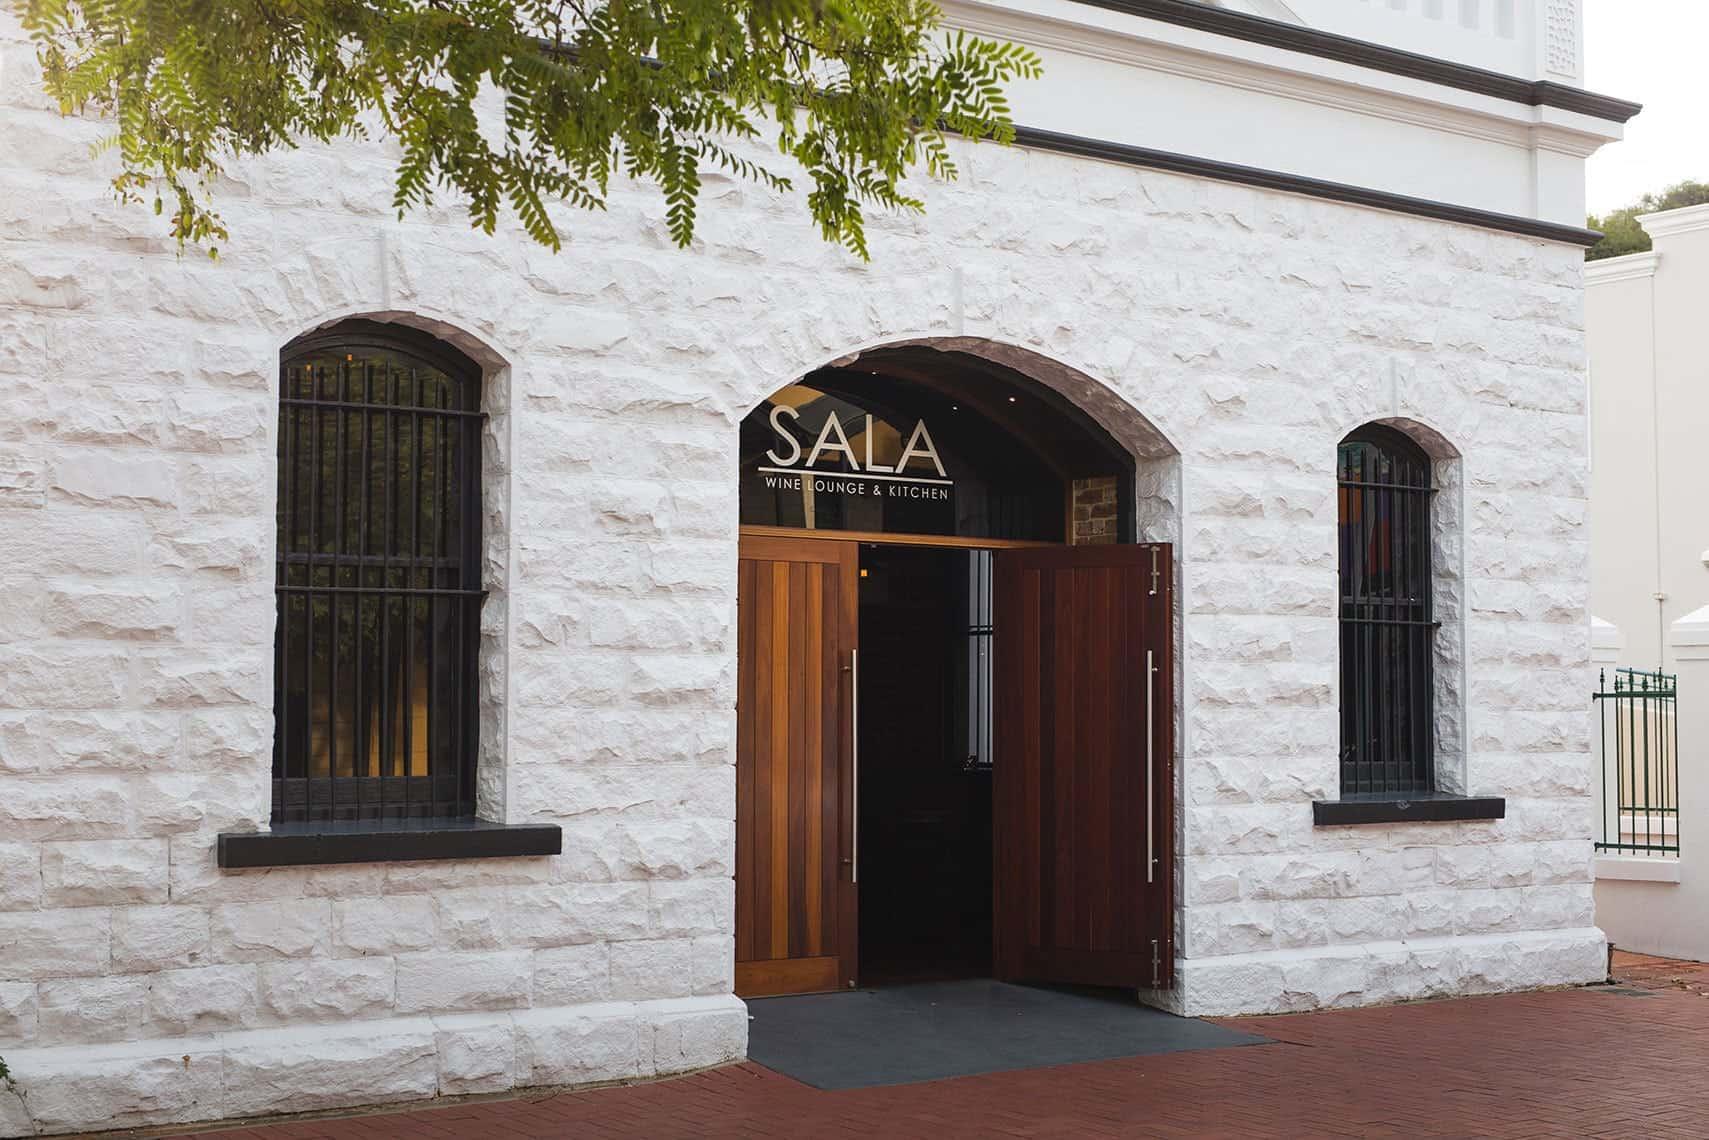 Sala Wine Lounge